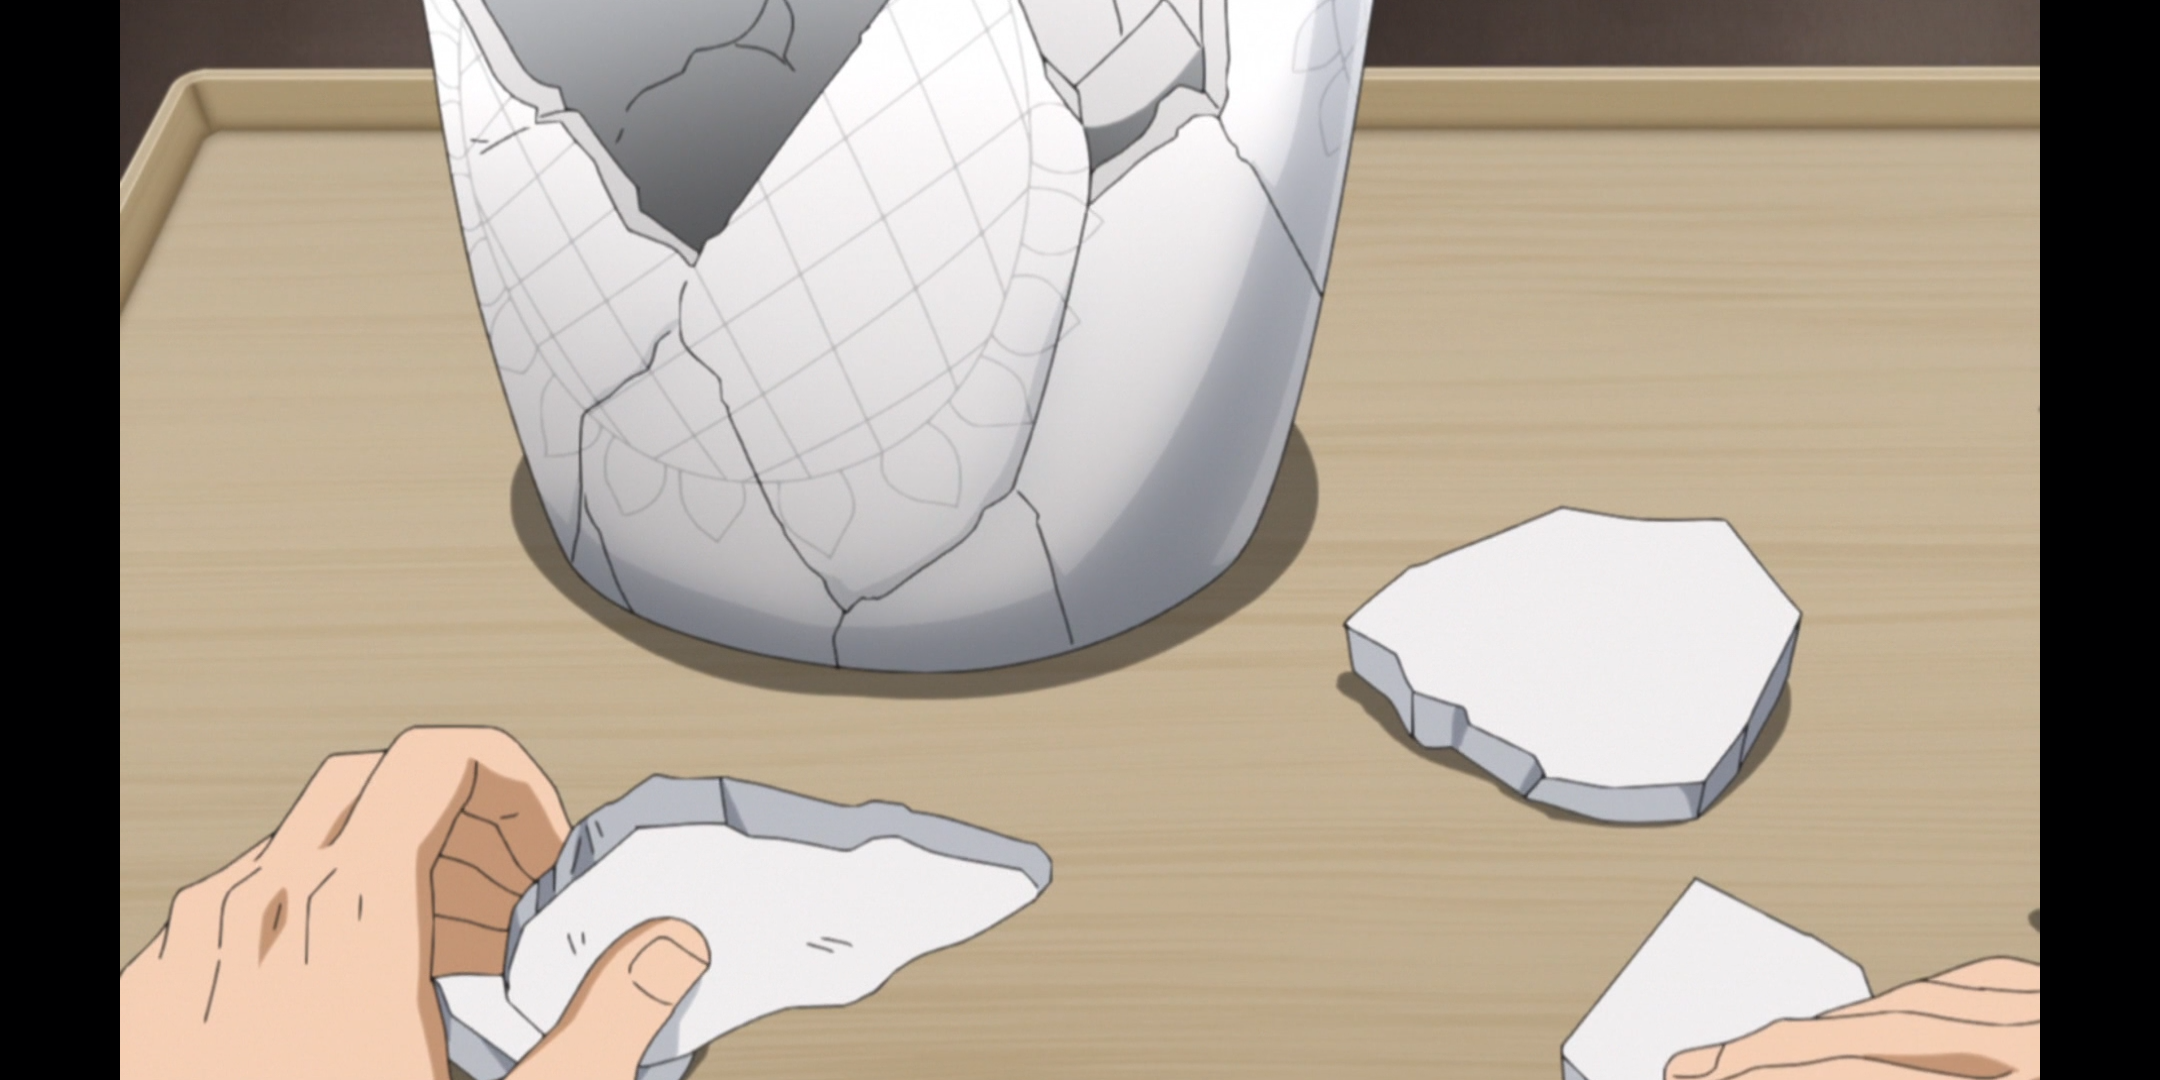 Kawaki monta vaso no episódio 197